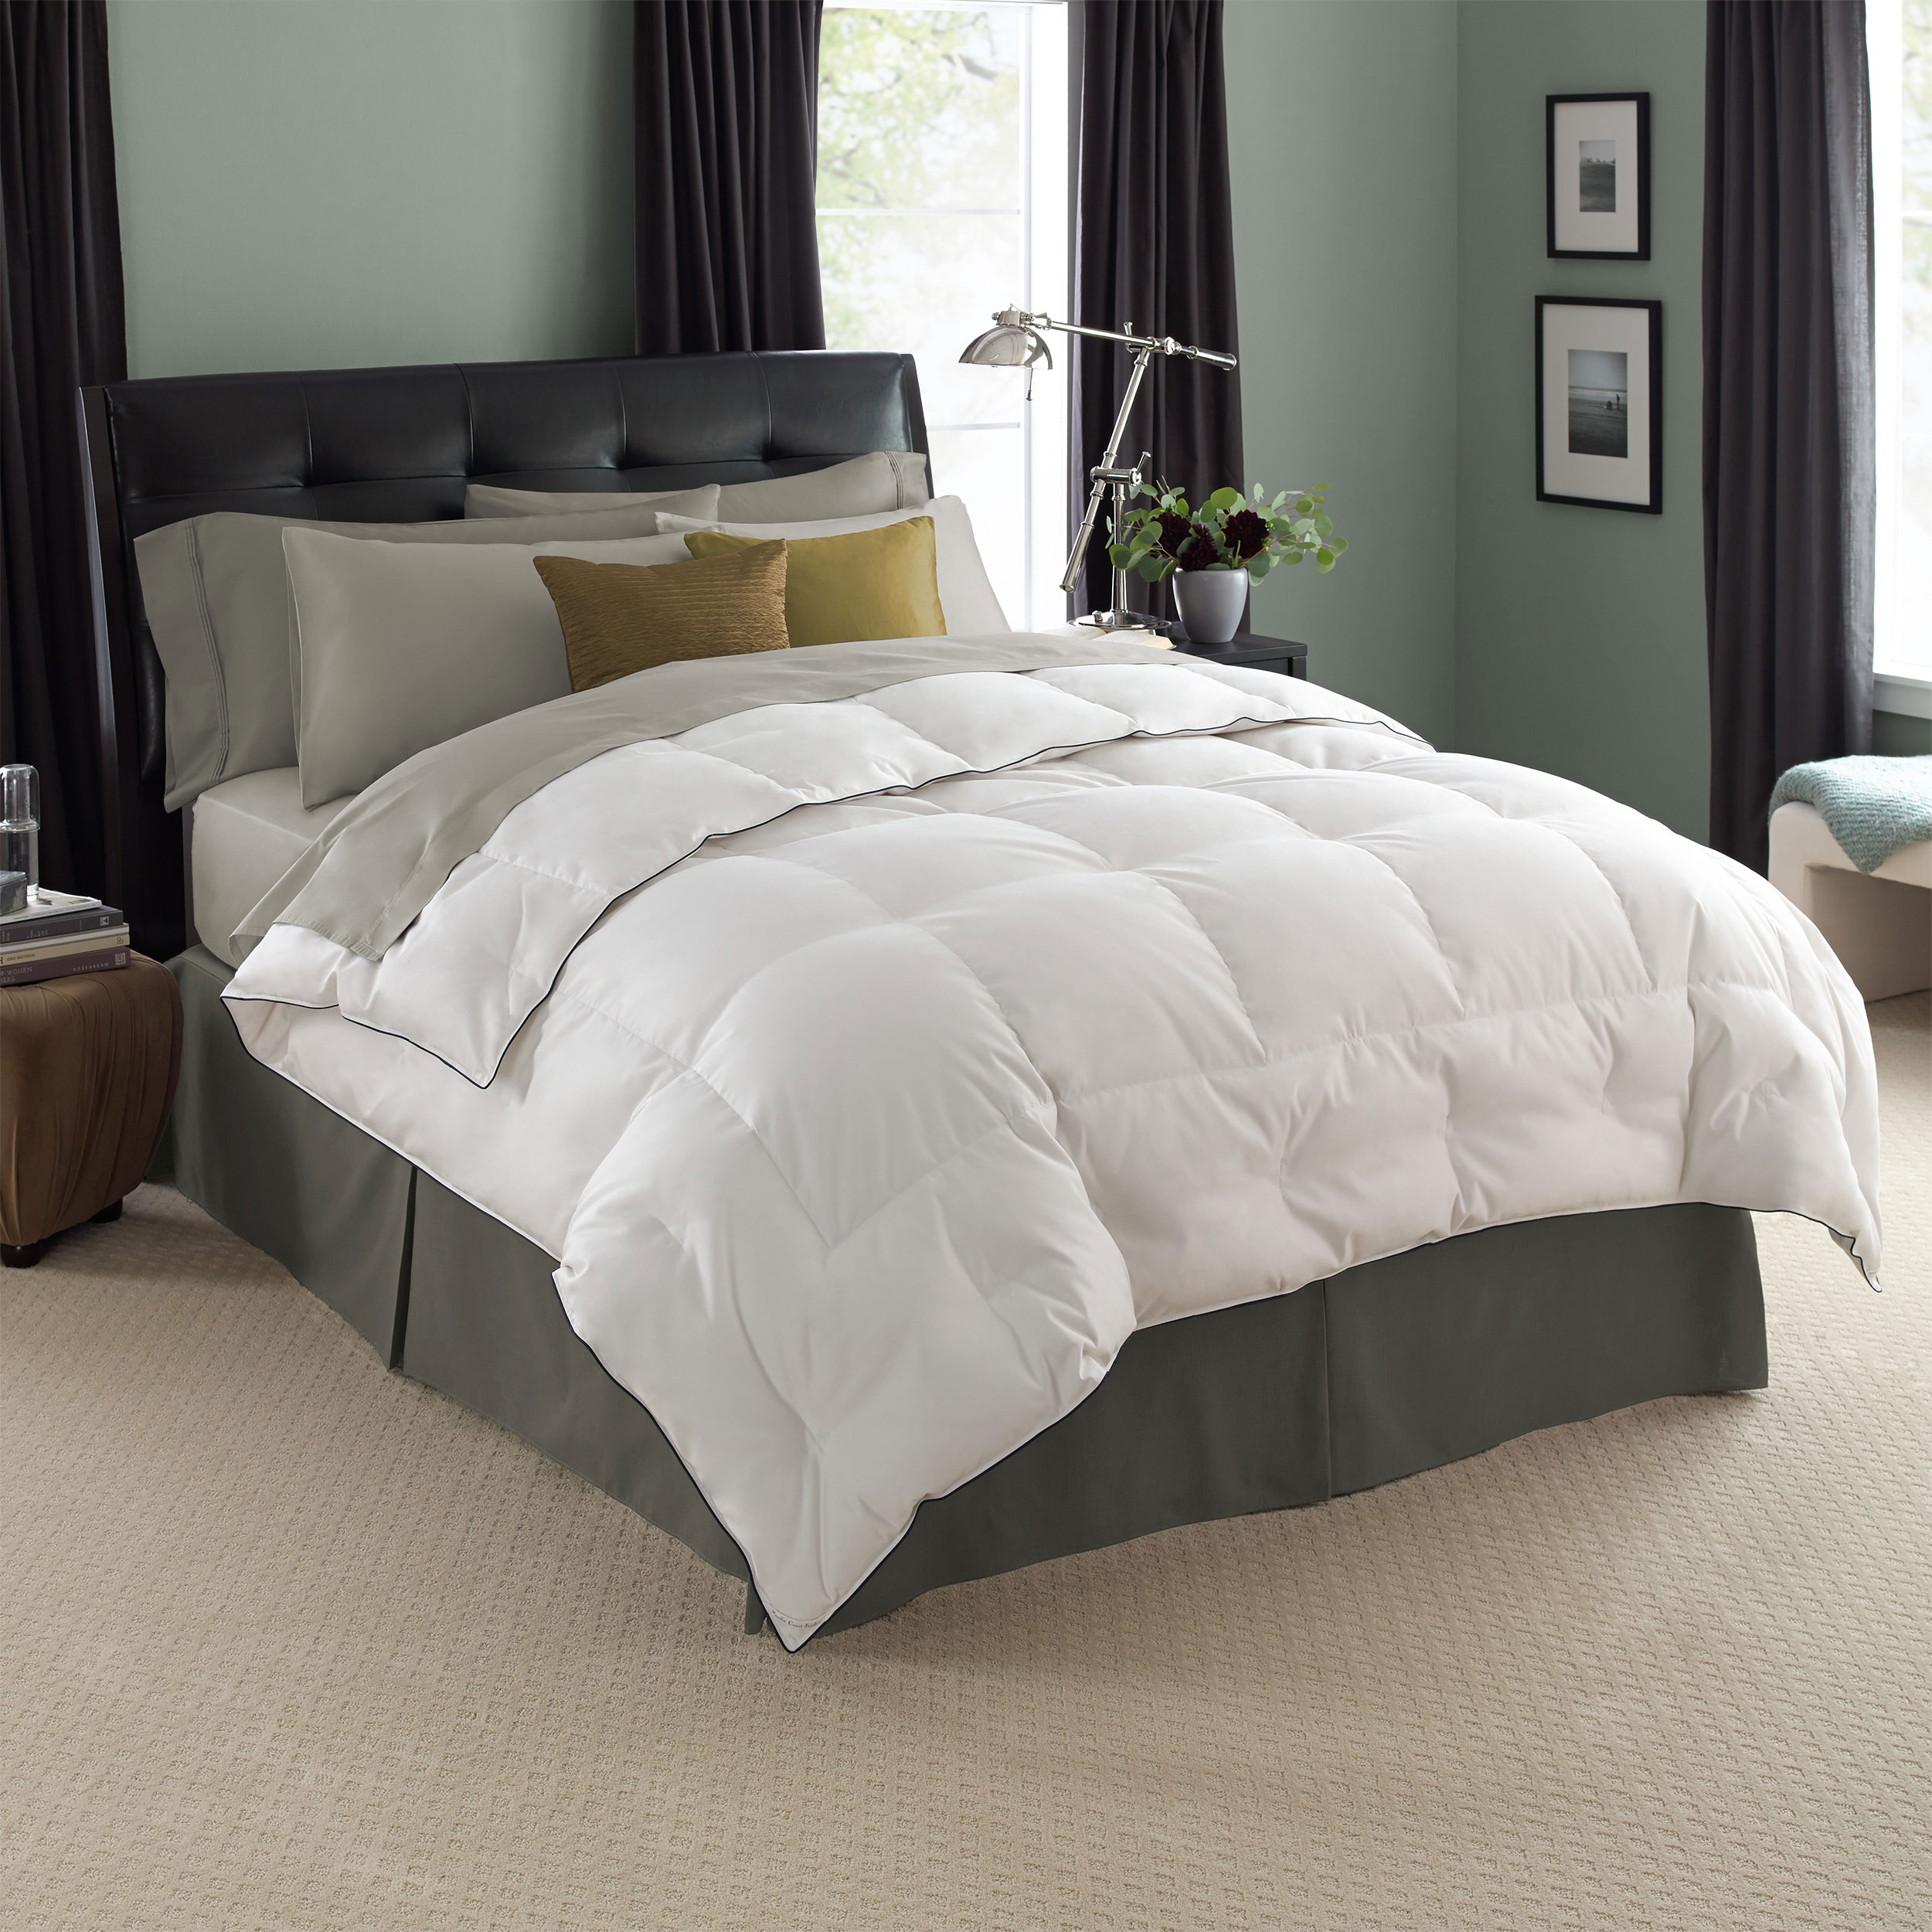 Washing A Down Comforter